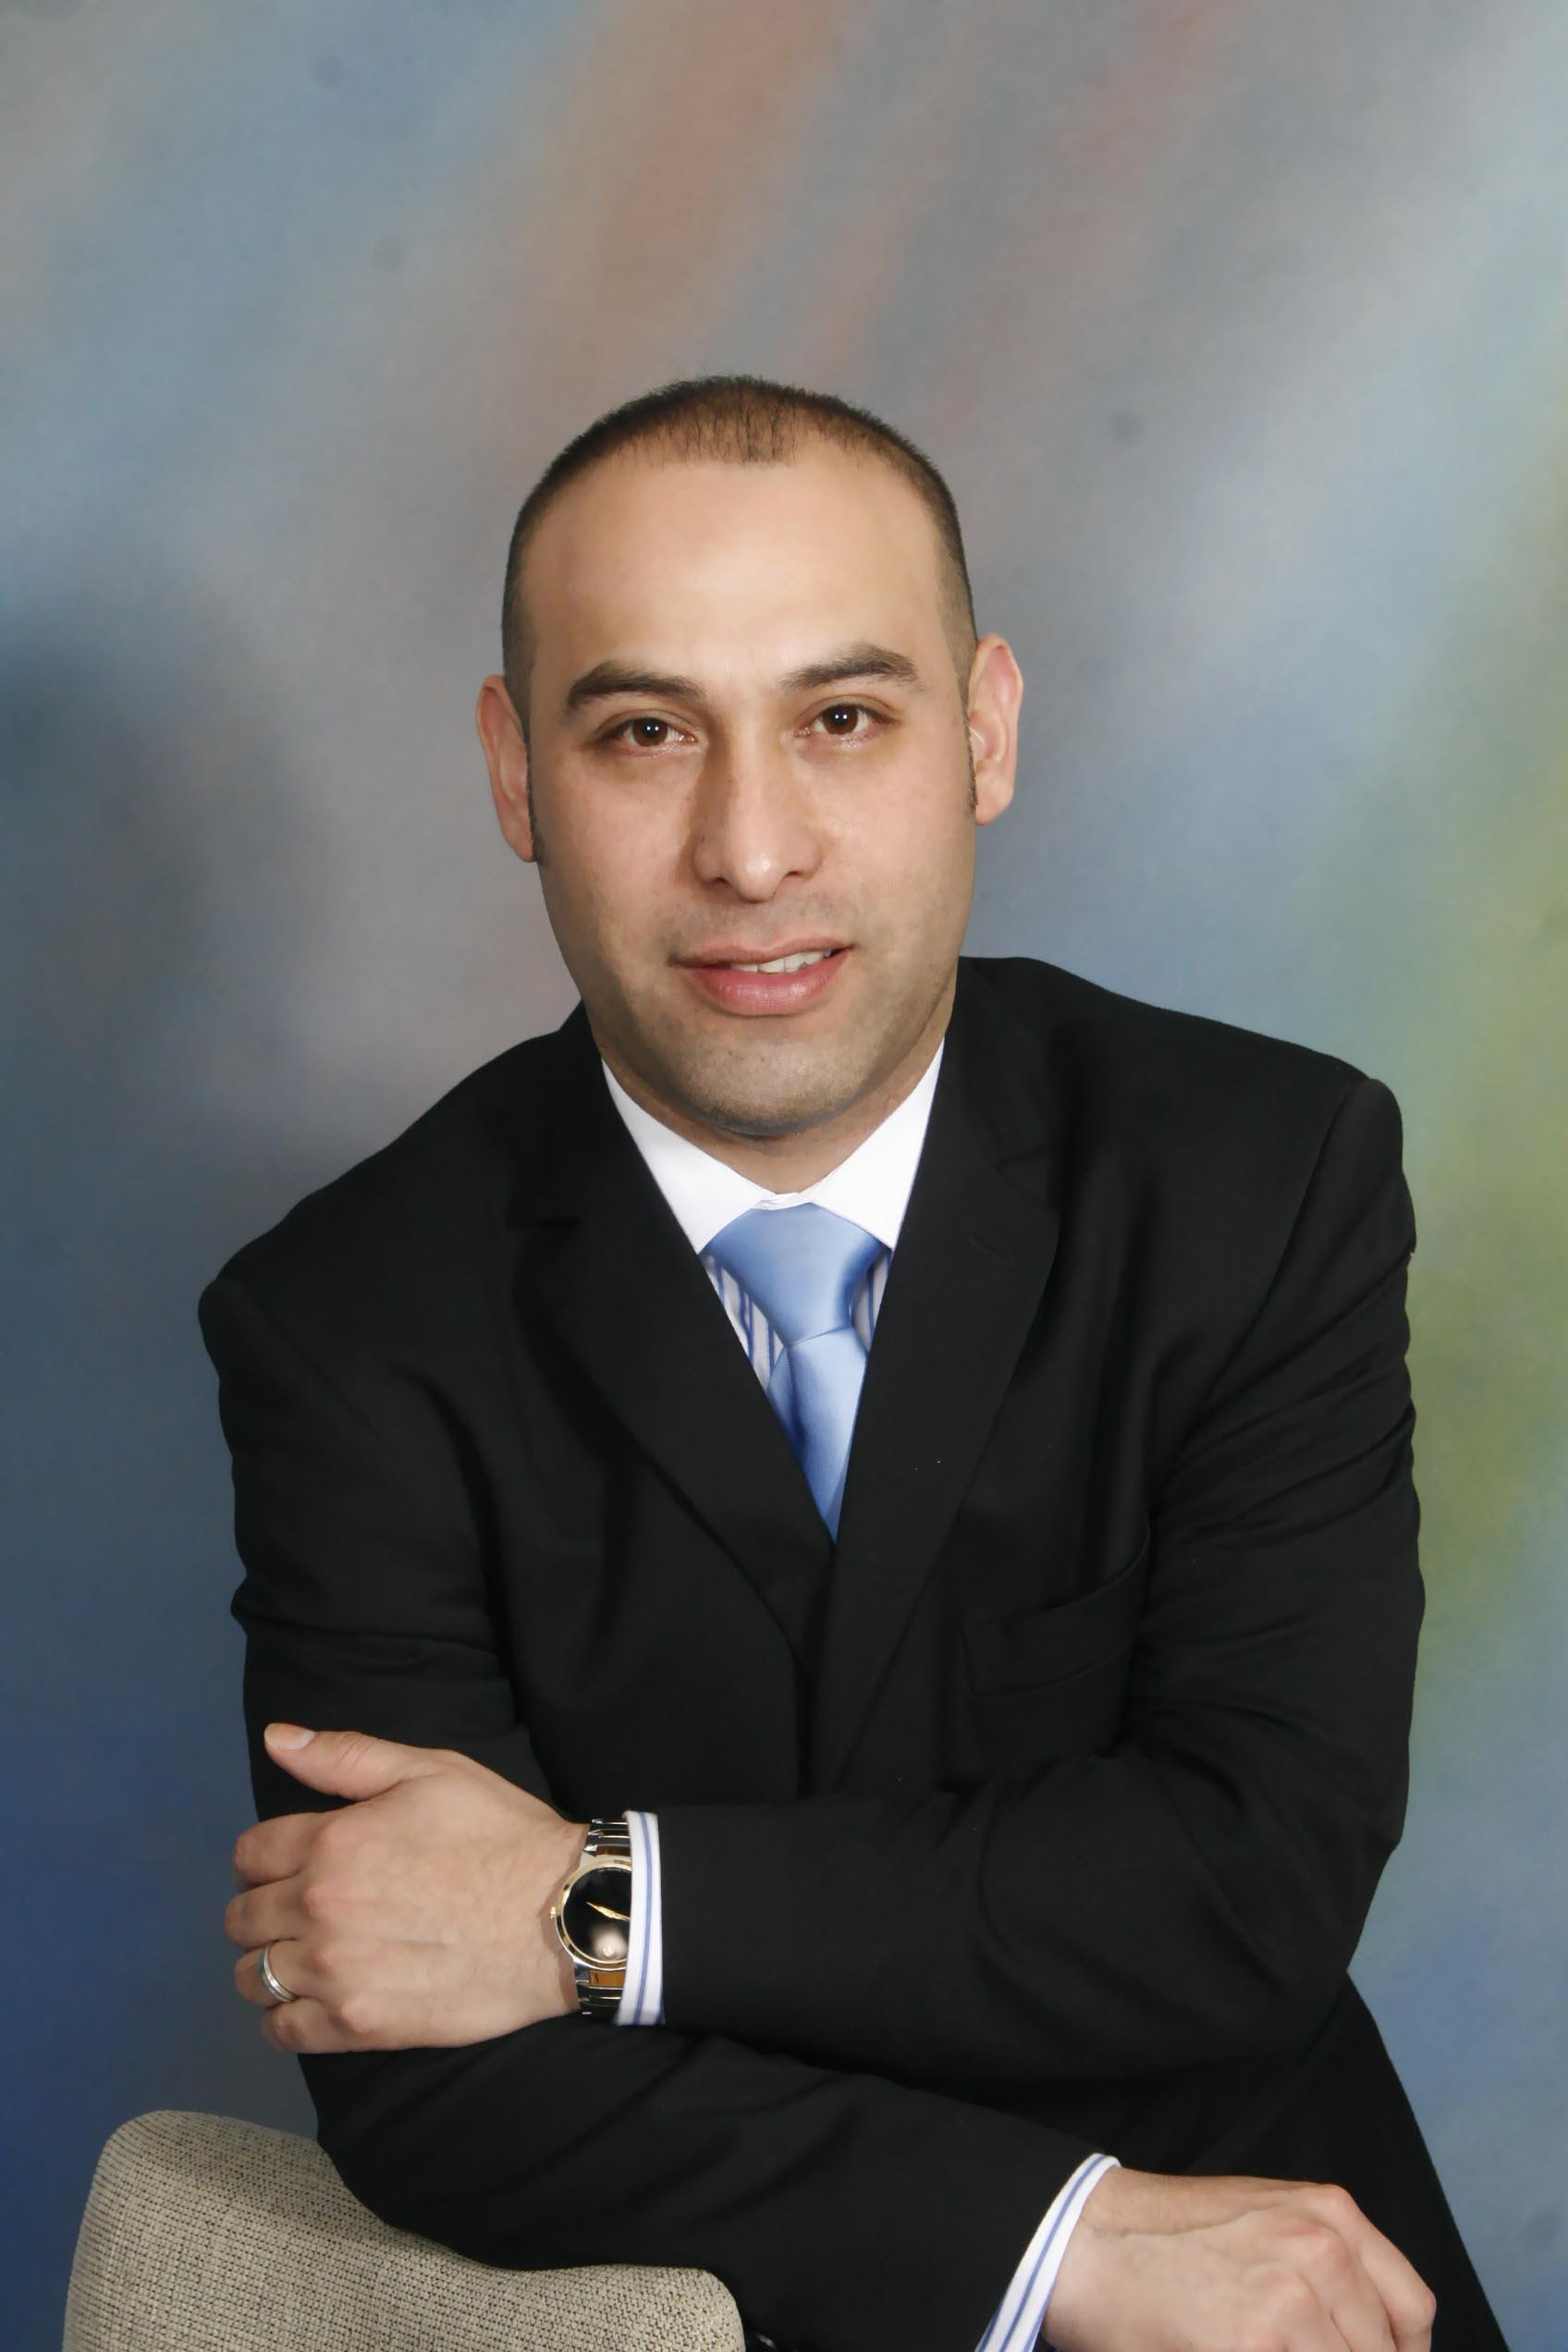 Insurance Agent CARLOS JHON MUHLIG serving NEW YORK, NY ...